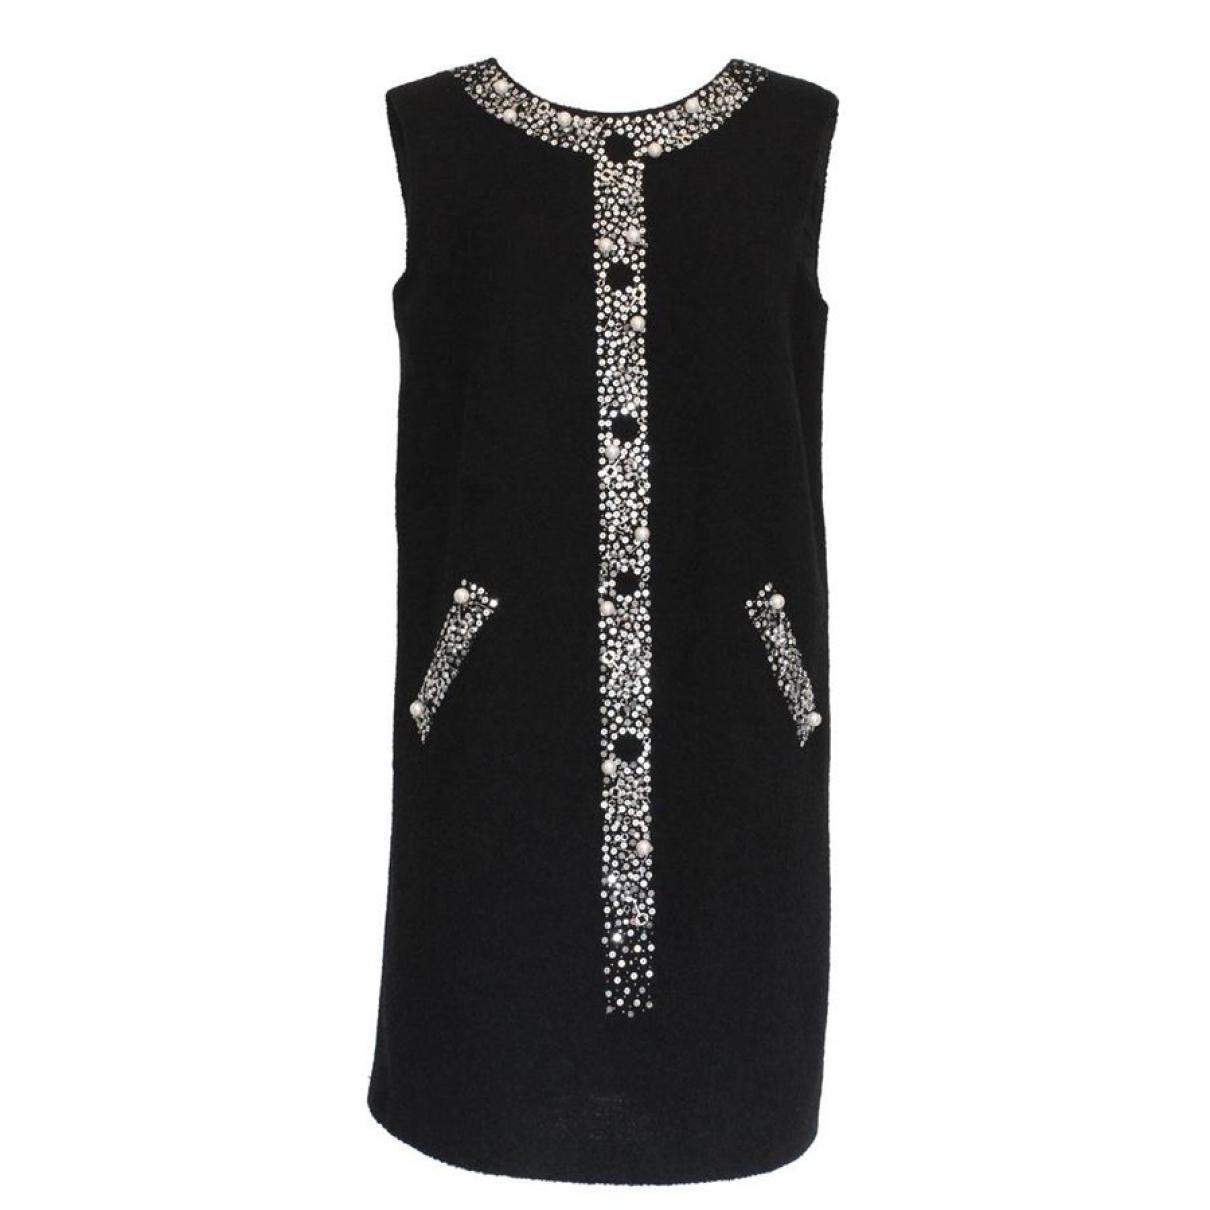 Moschino \N Black Wool dress for Women 44 IT